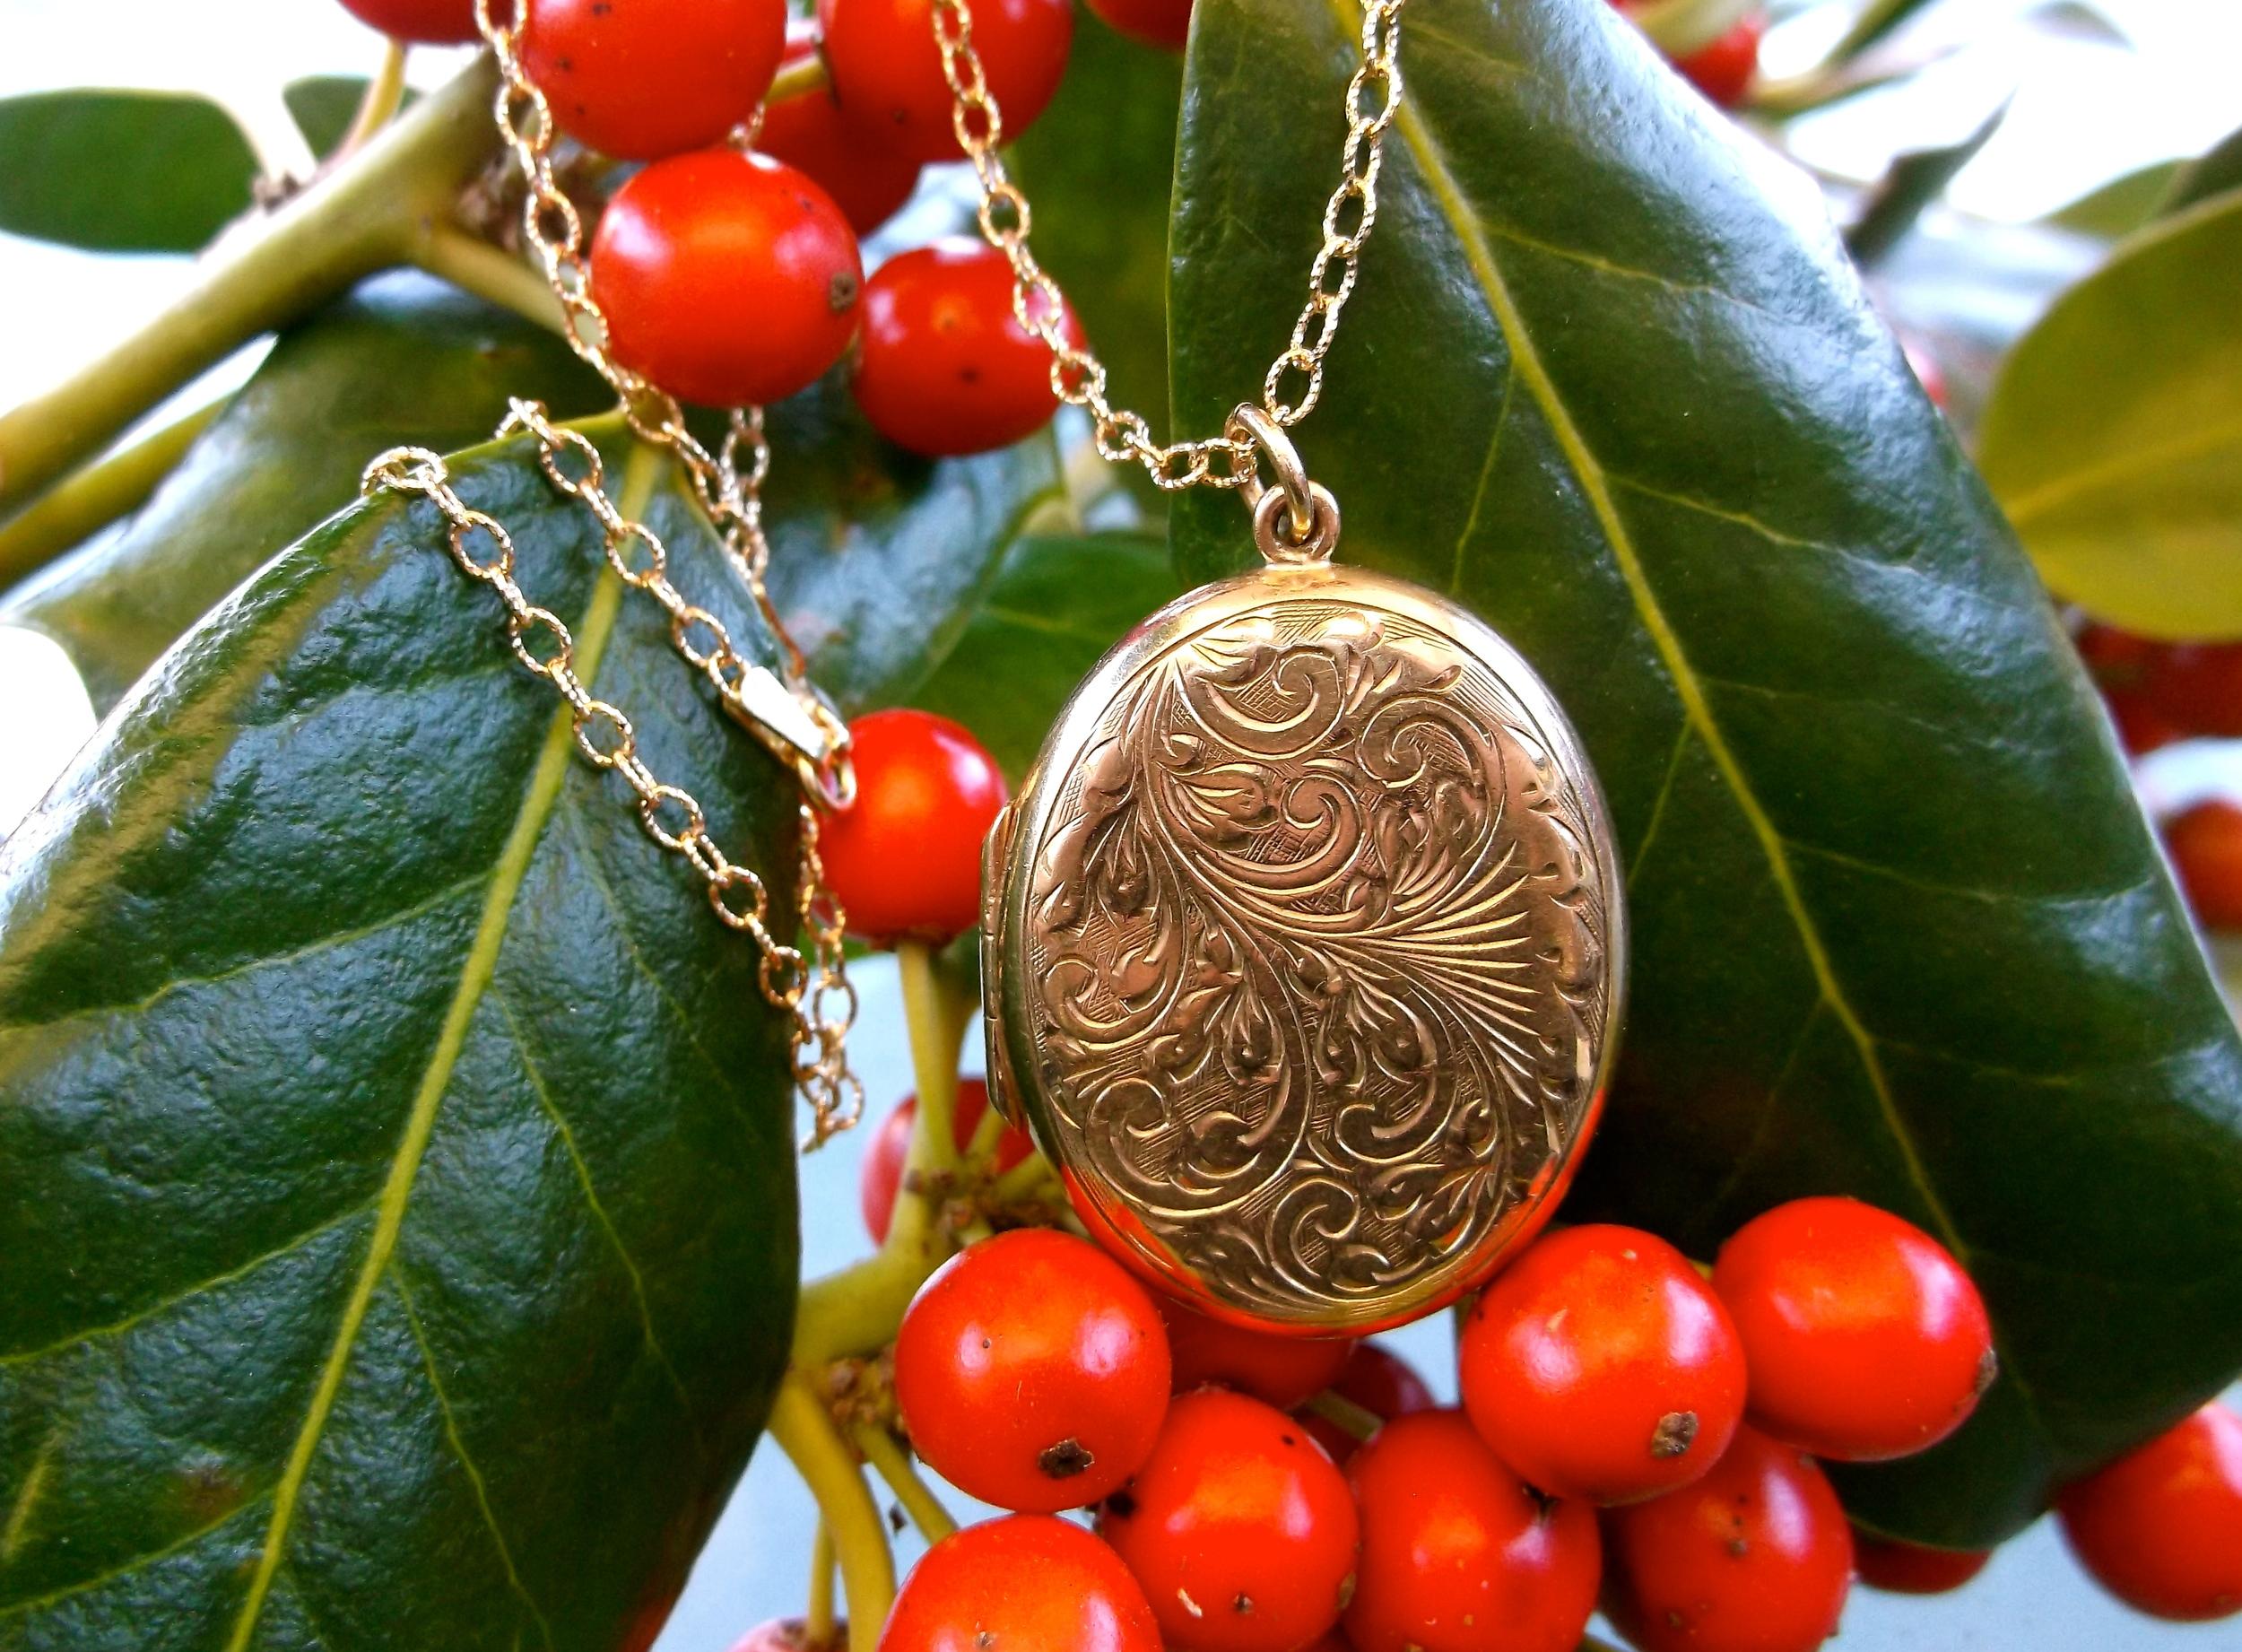 For December: An engraved gold locket (slightly bigger than a quarter).